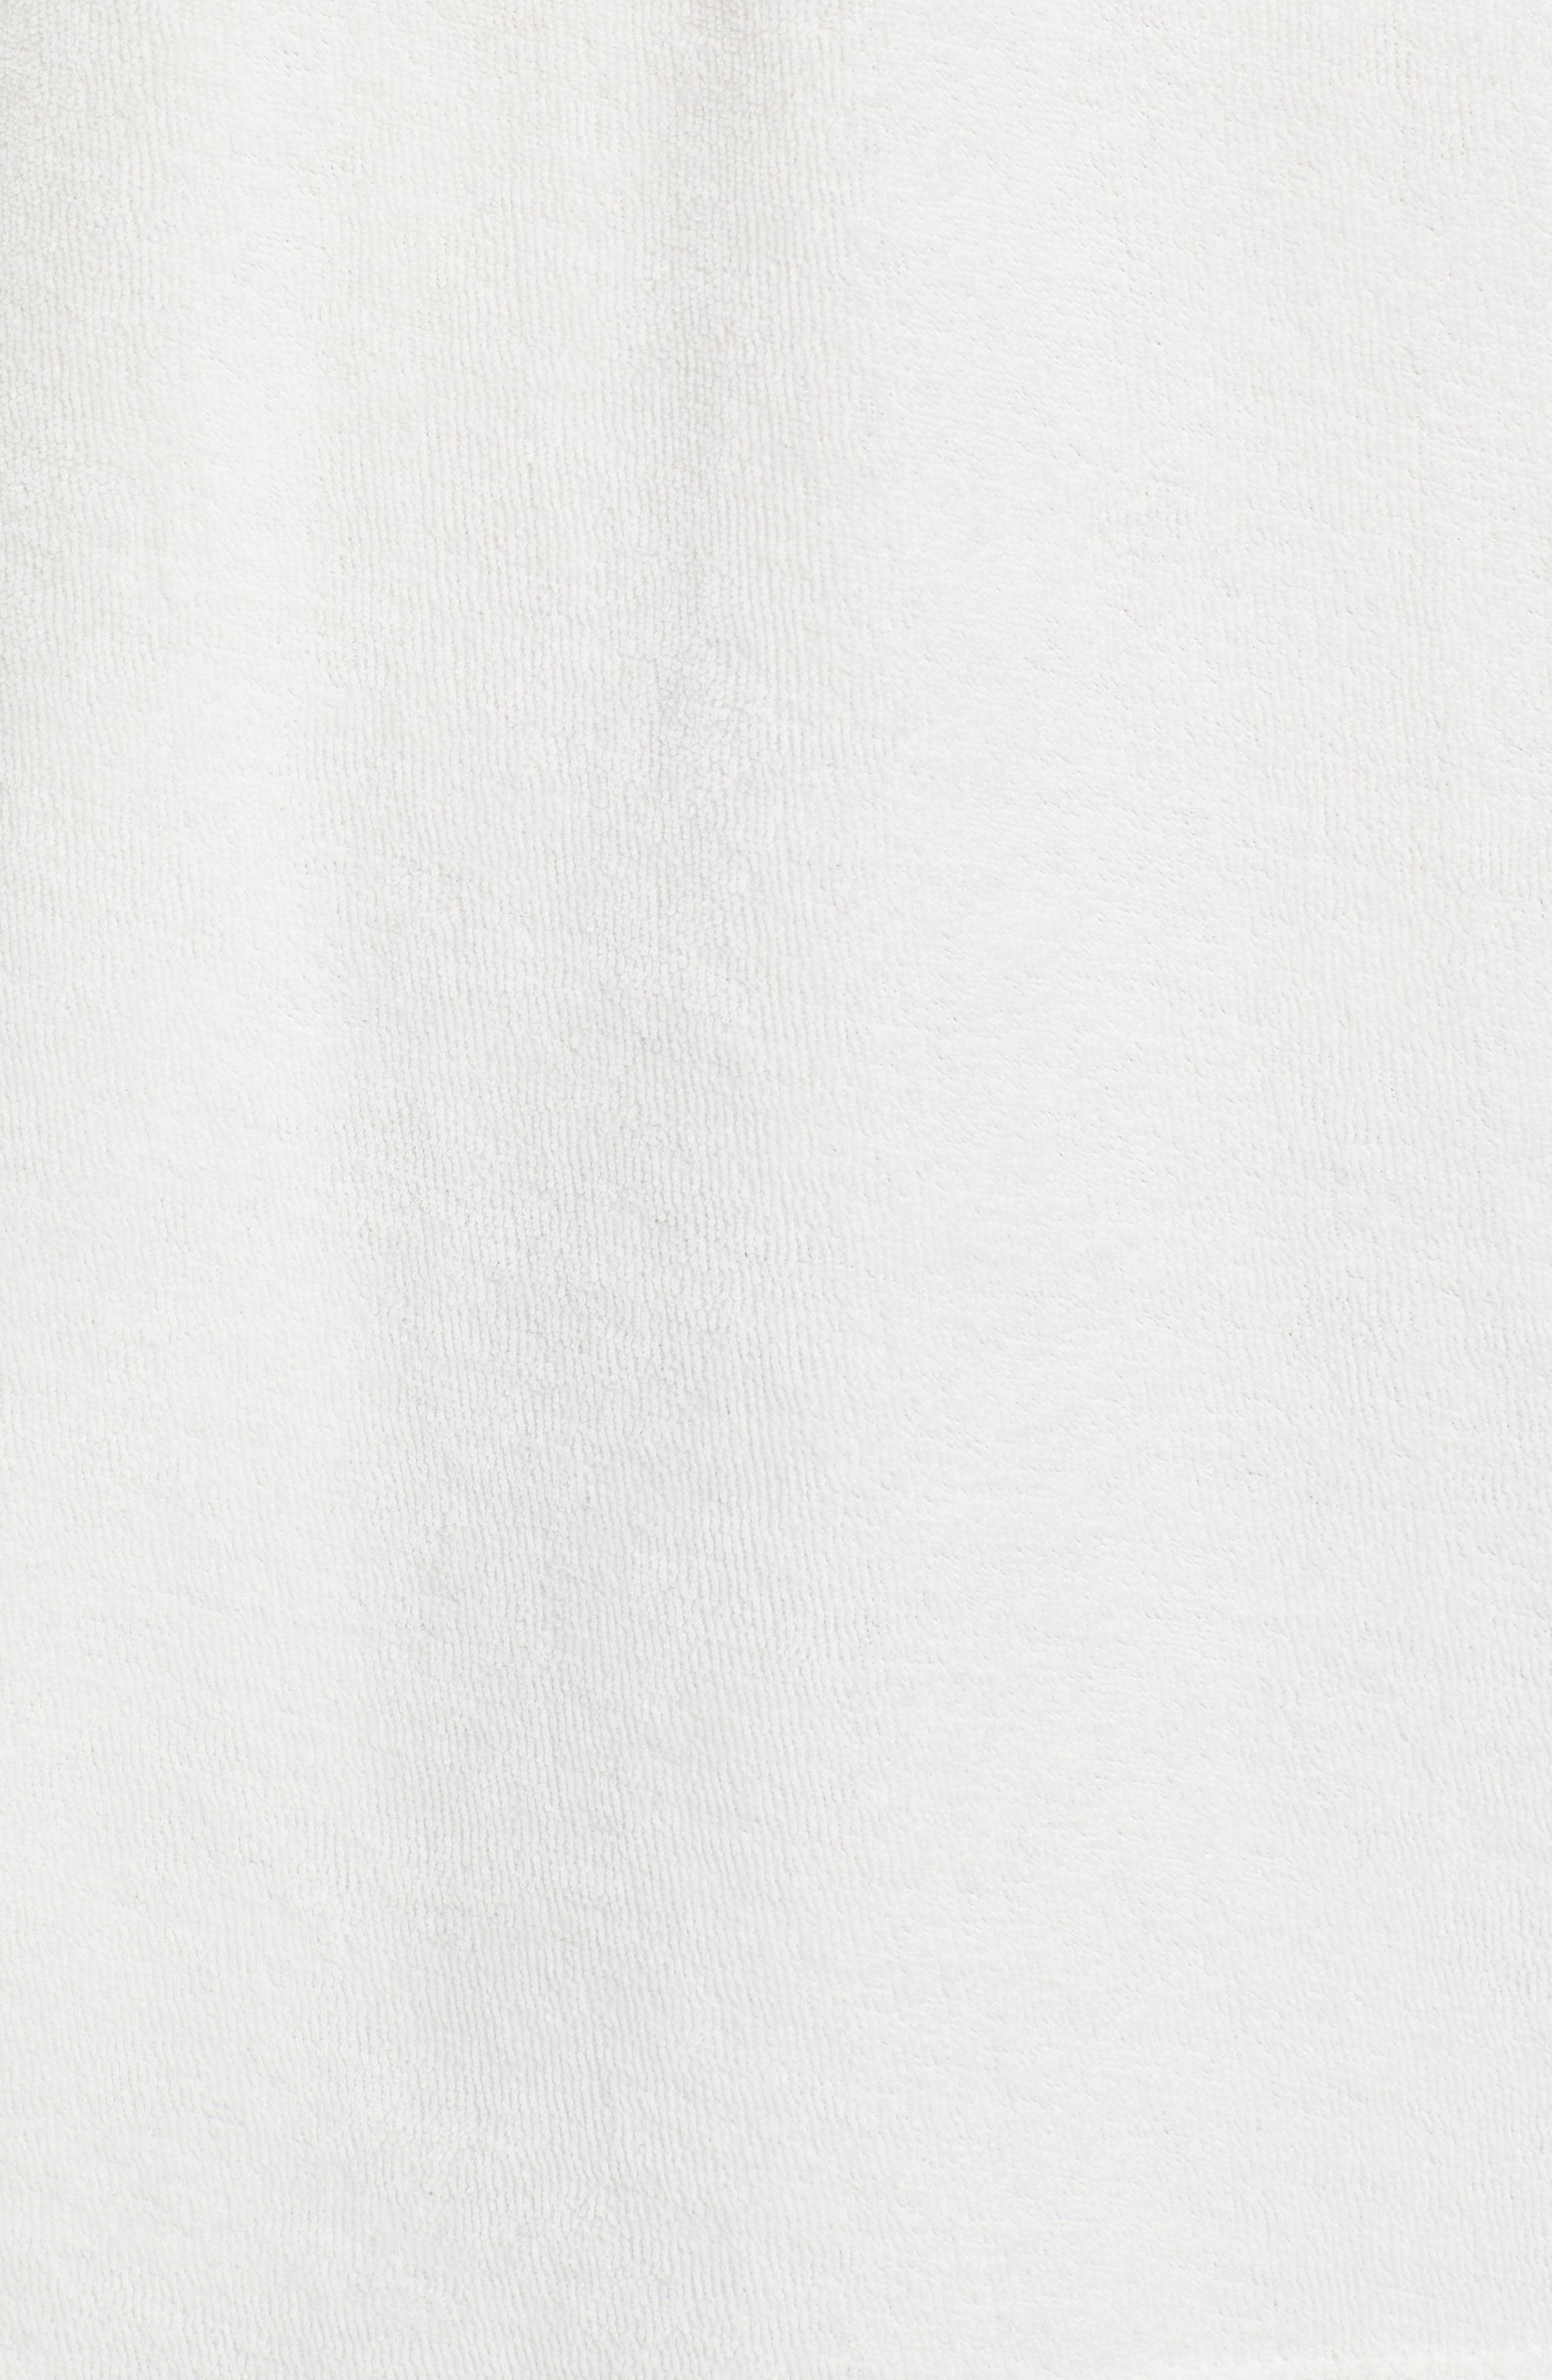 Towel Whip Polo,                             Alternate thumbnail 4, color,                             Milk